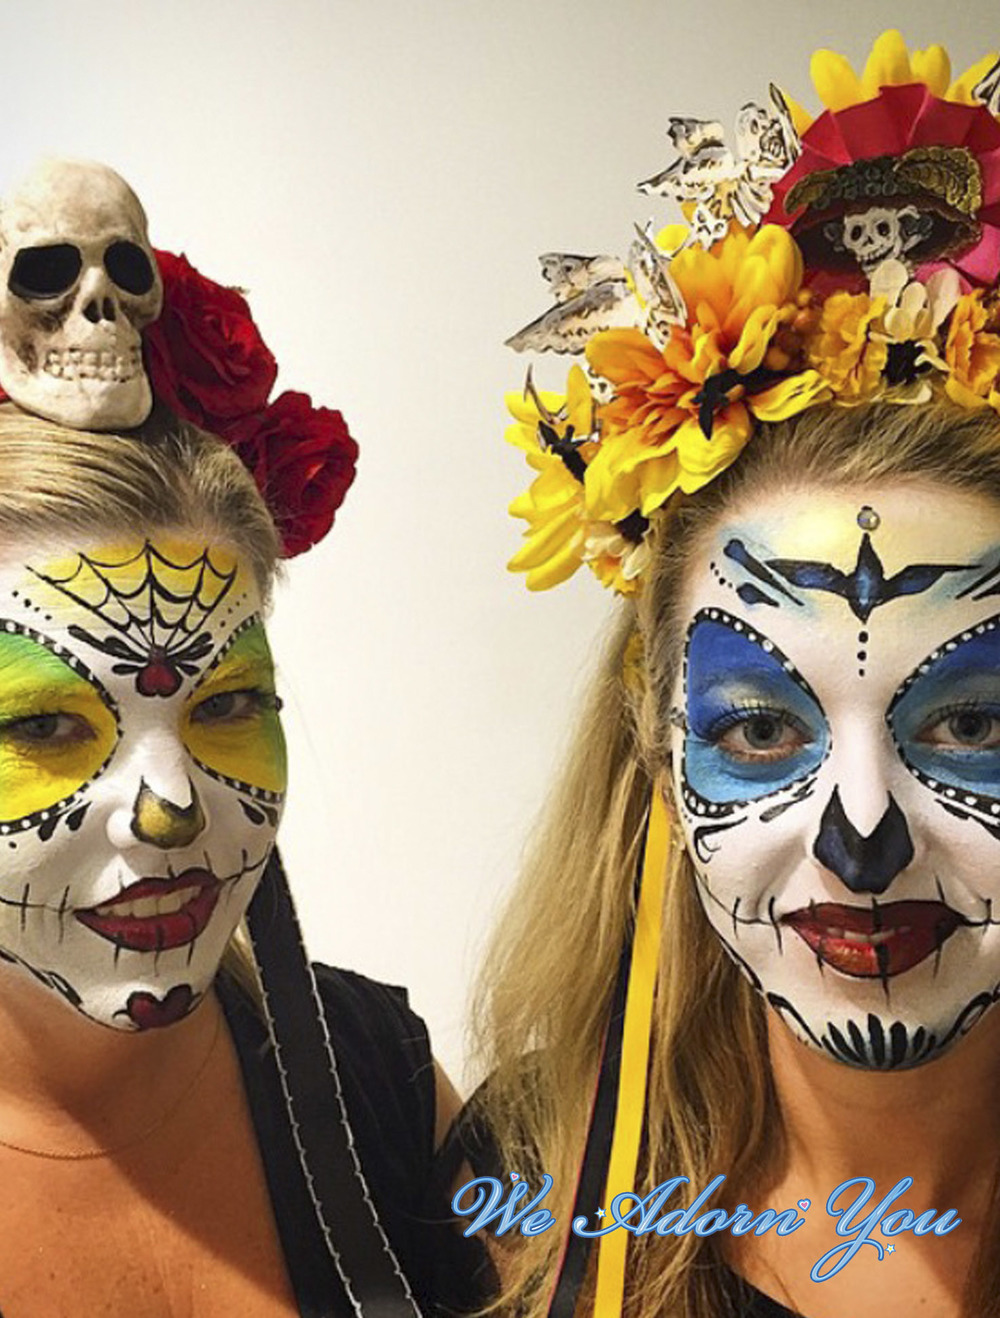 Face Painting Sugar Skull - We Adorn You.jpg